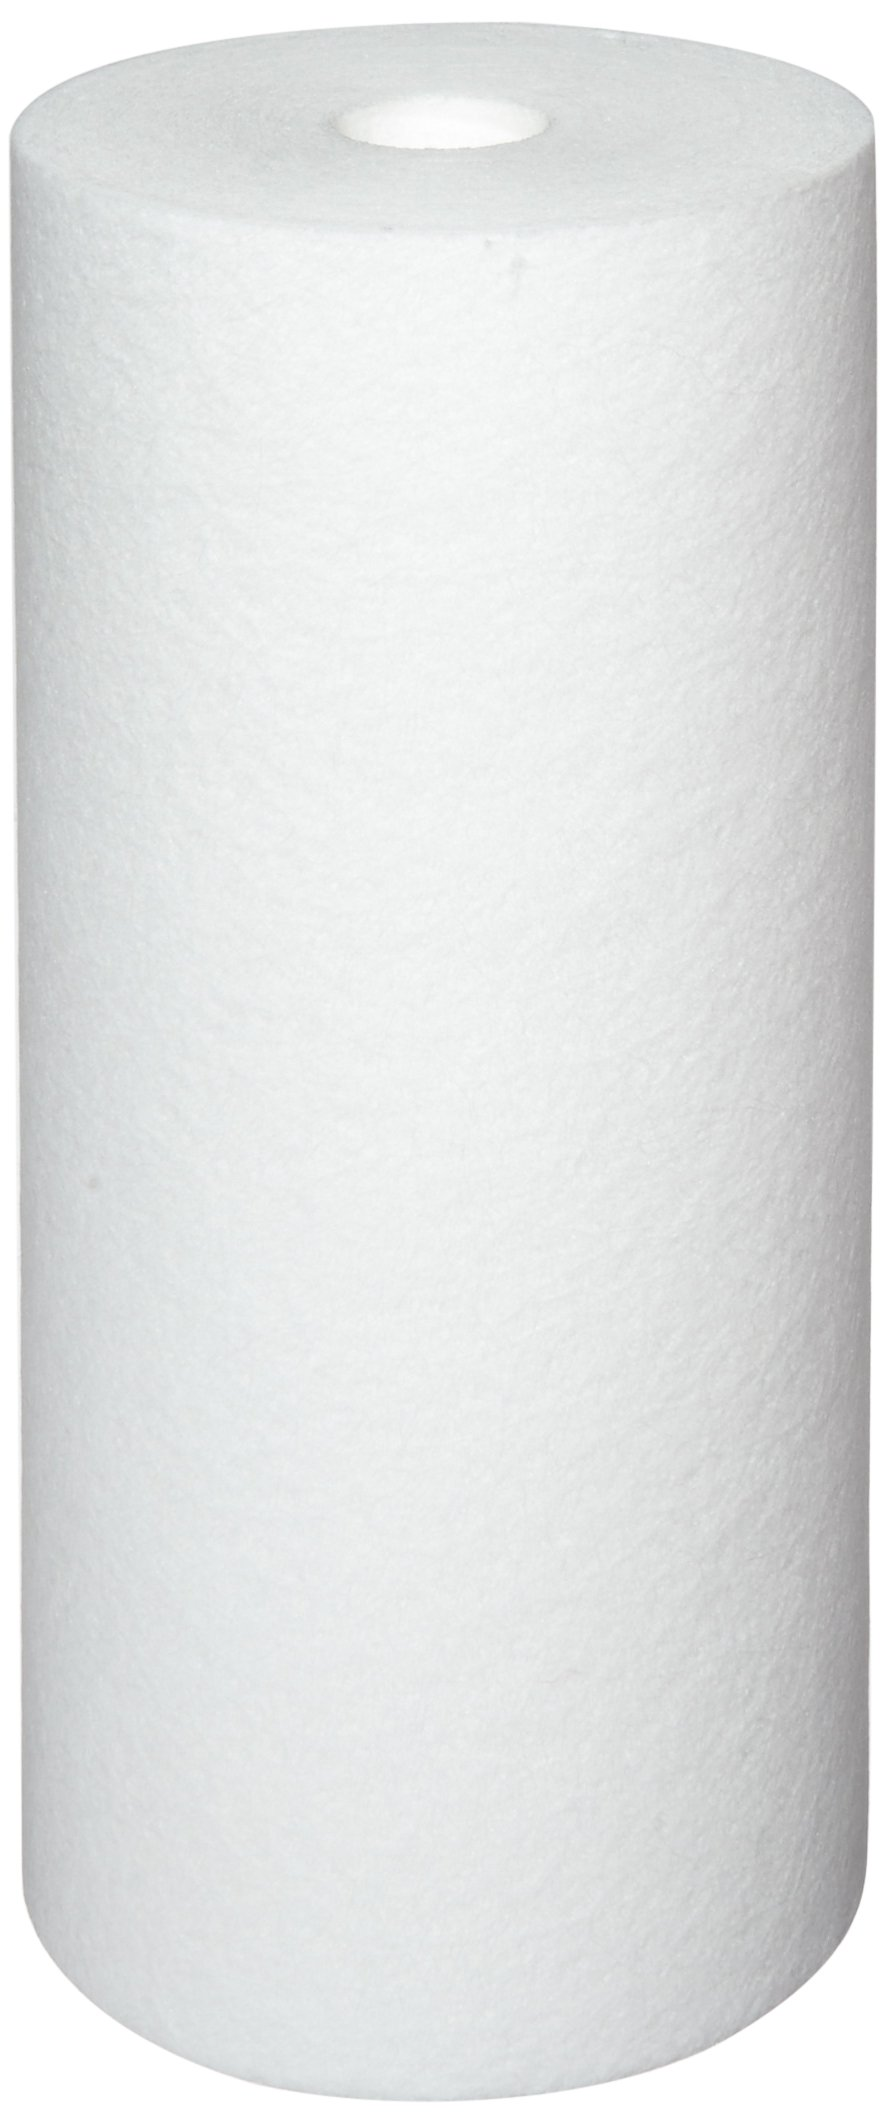 Pentek DGD-5005 Spun Polypropylene Filter Cartridge, 10'' x 4-1/2'' by Pentek